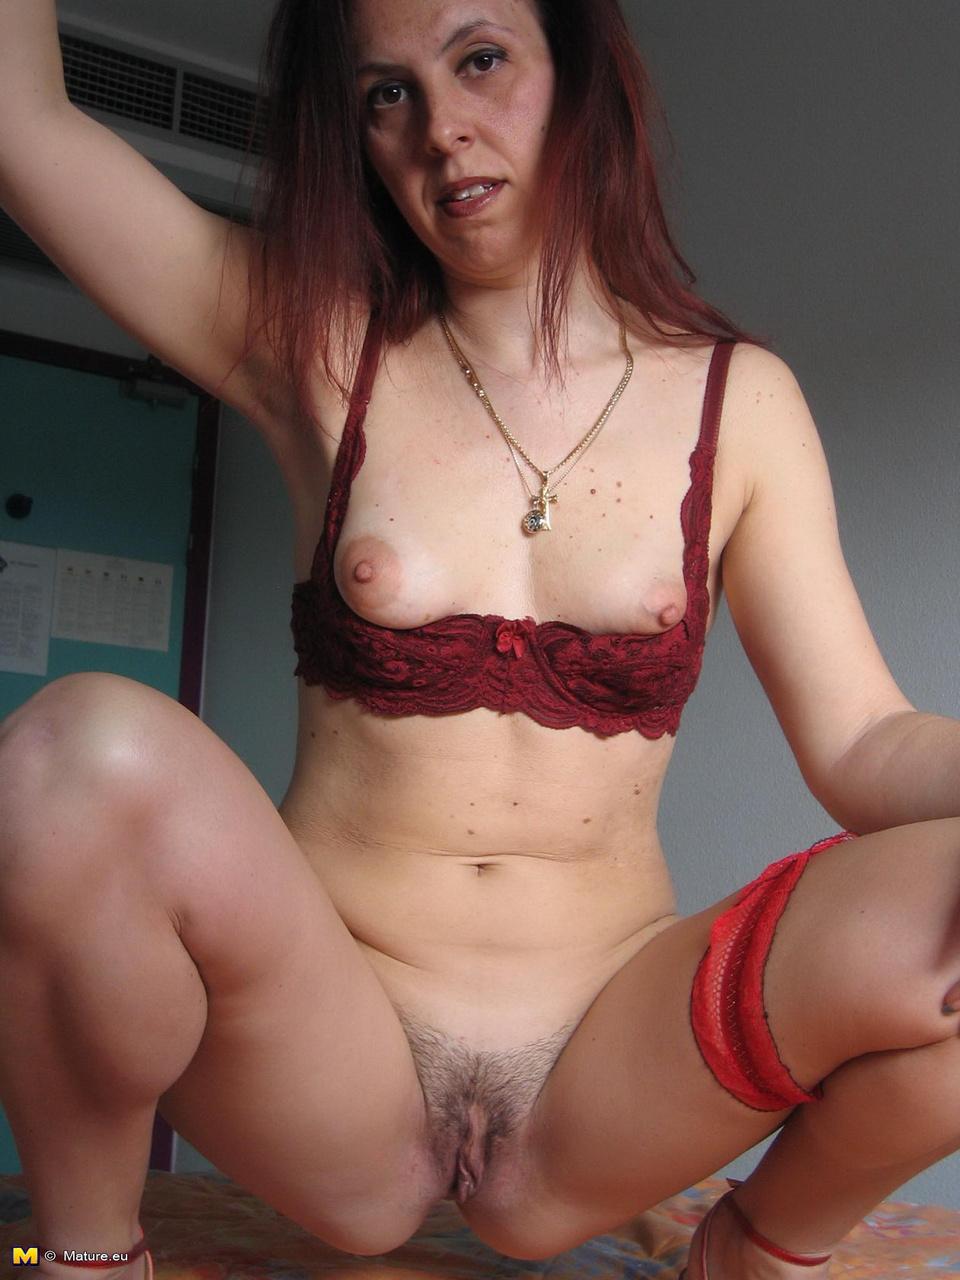 porno-zrelie-lifchik